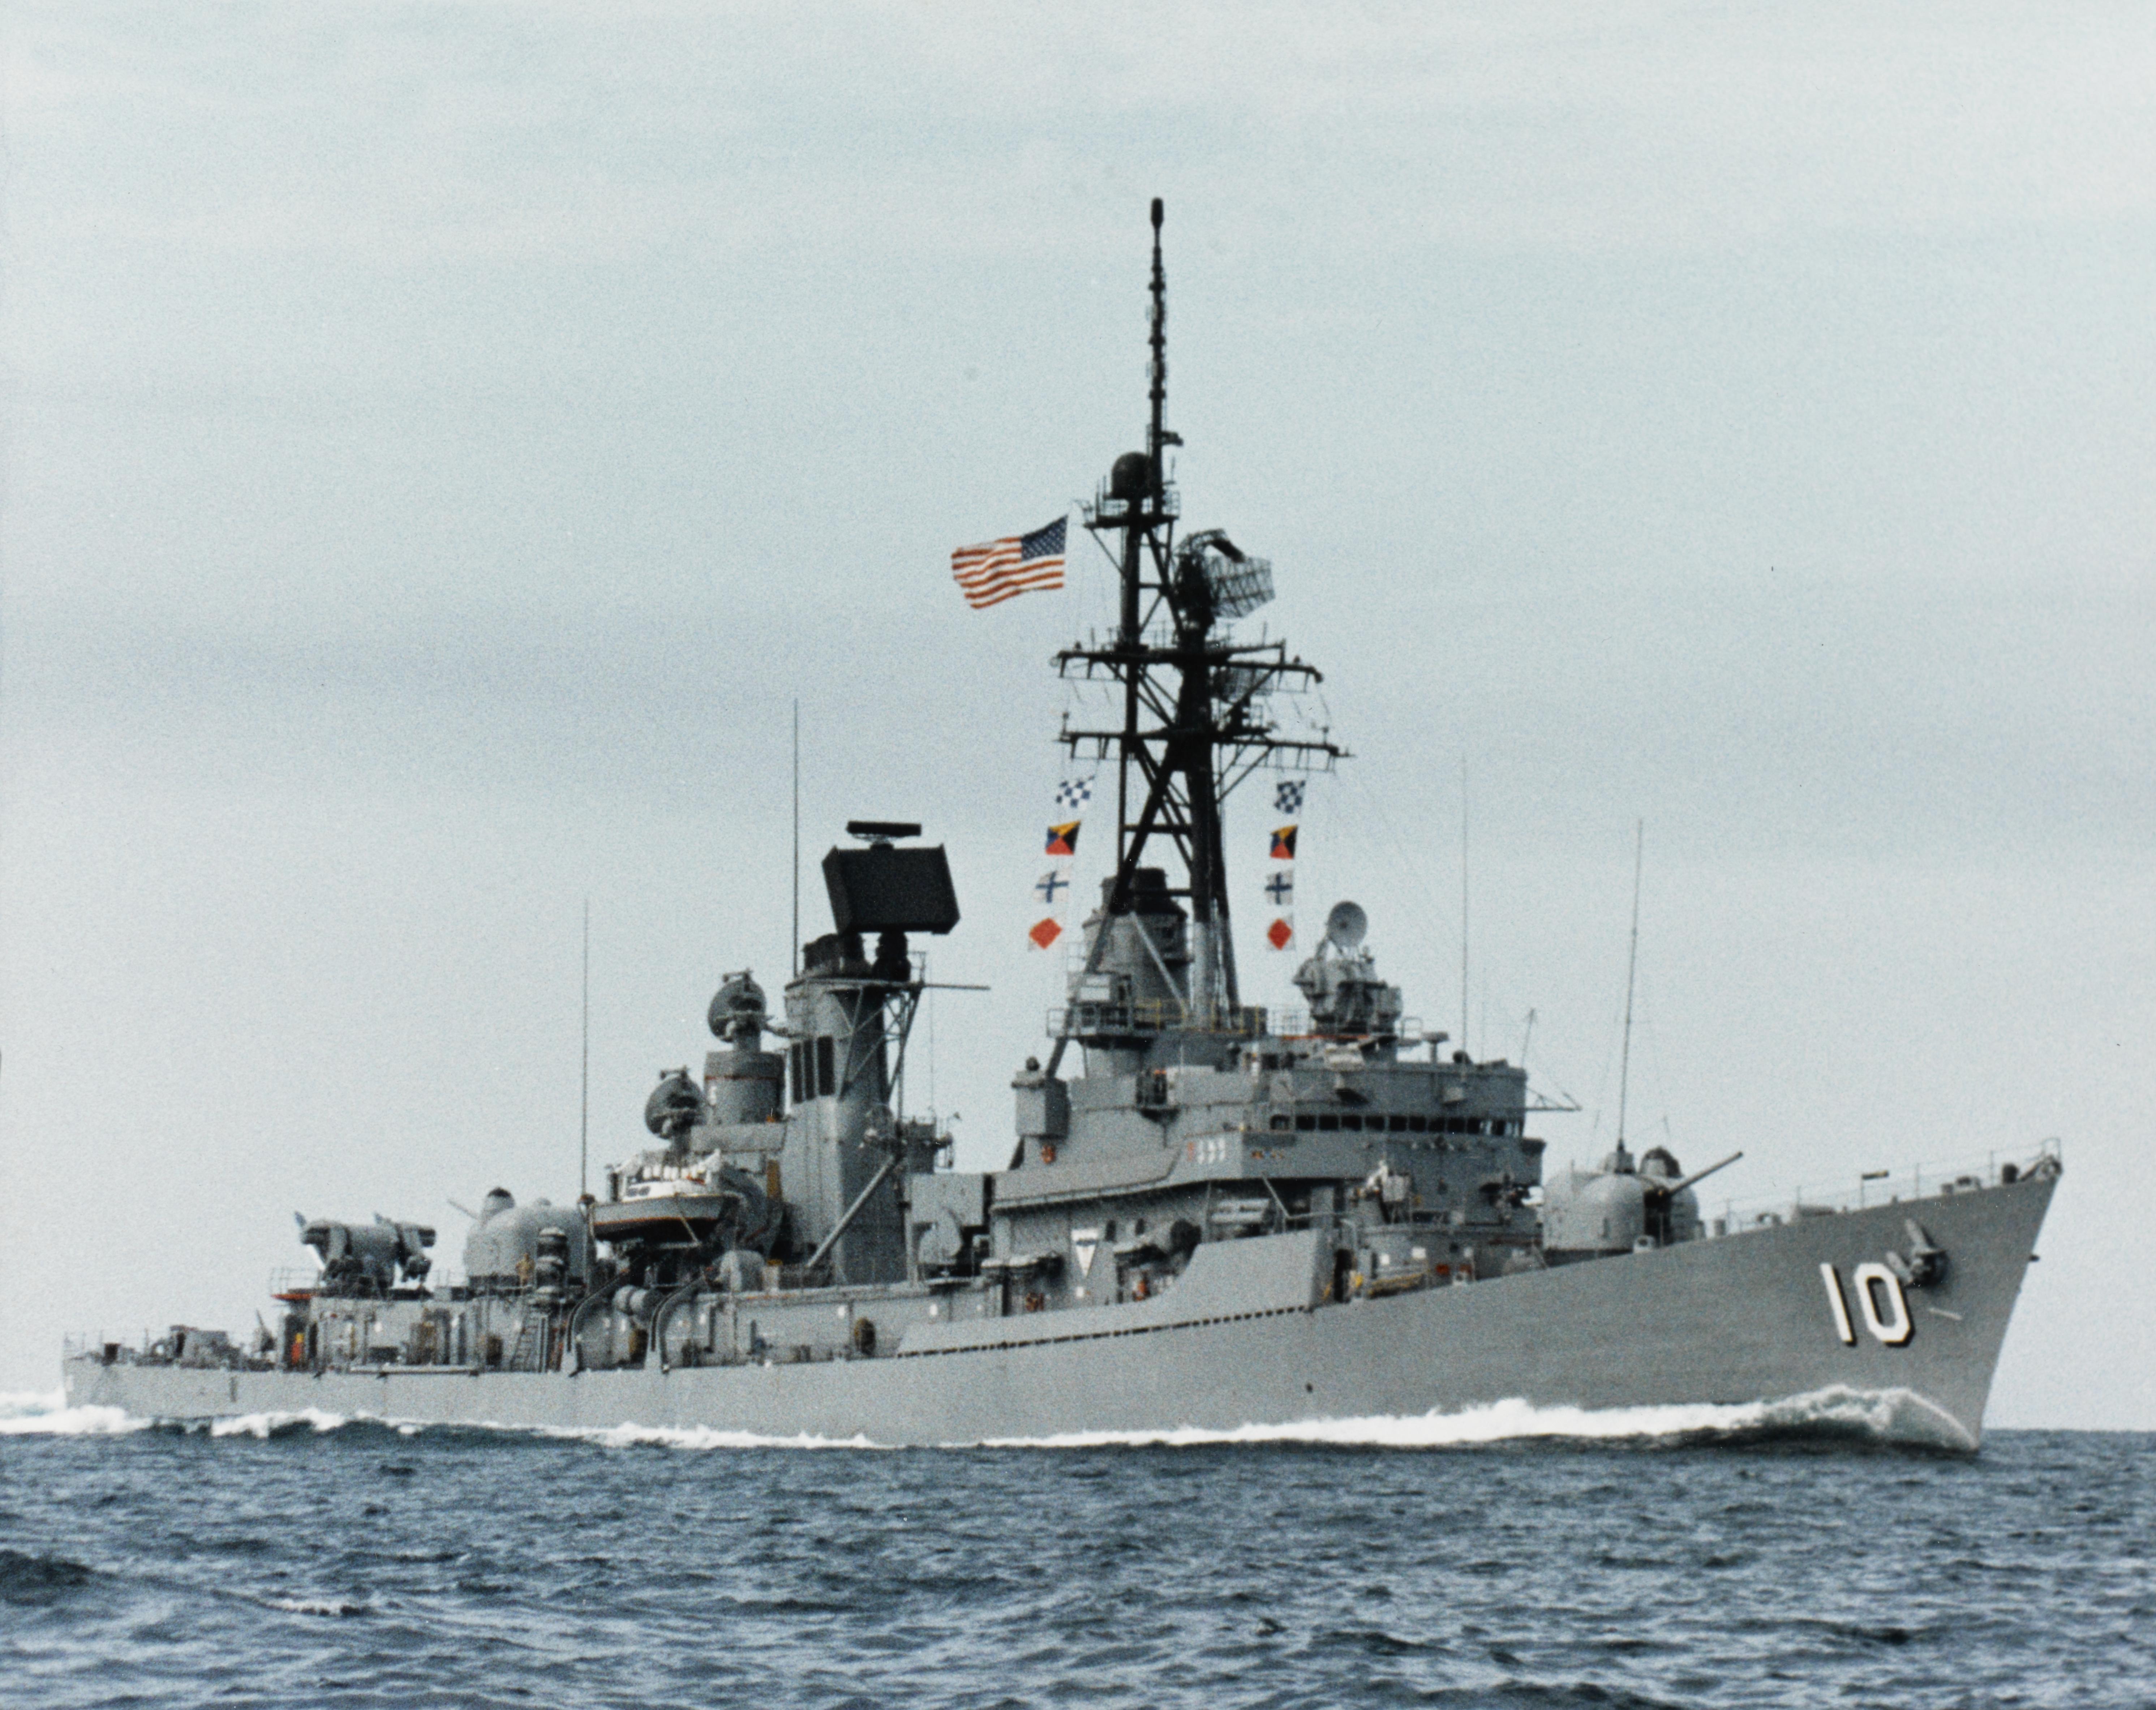 USS BERKELEY DDG 15 Guided Missile Destroyer,US Naval Ship,USN Navy Photo Print